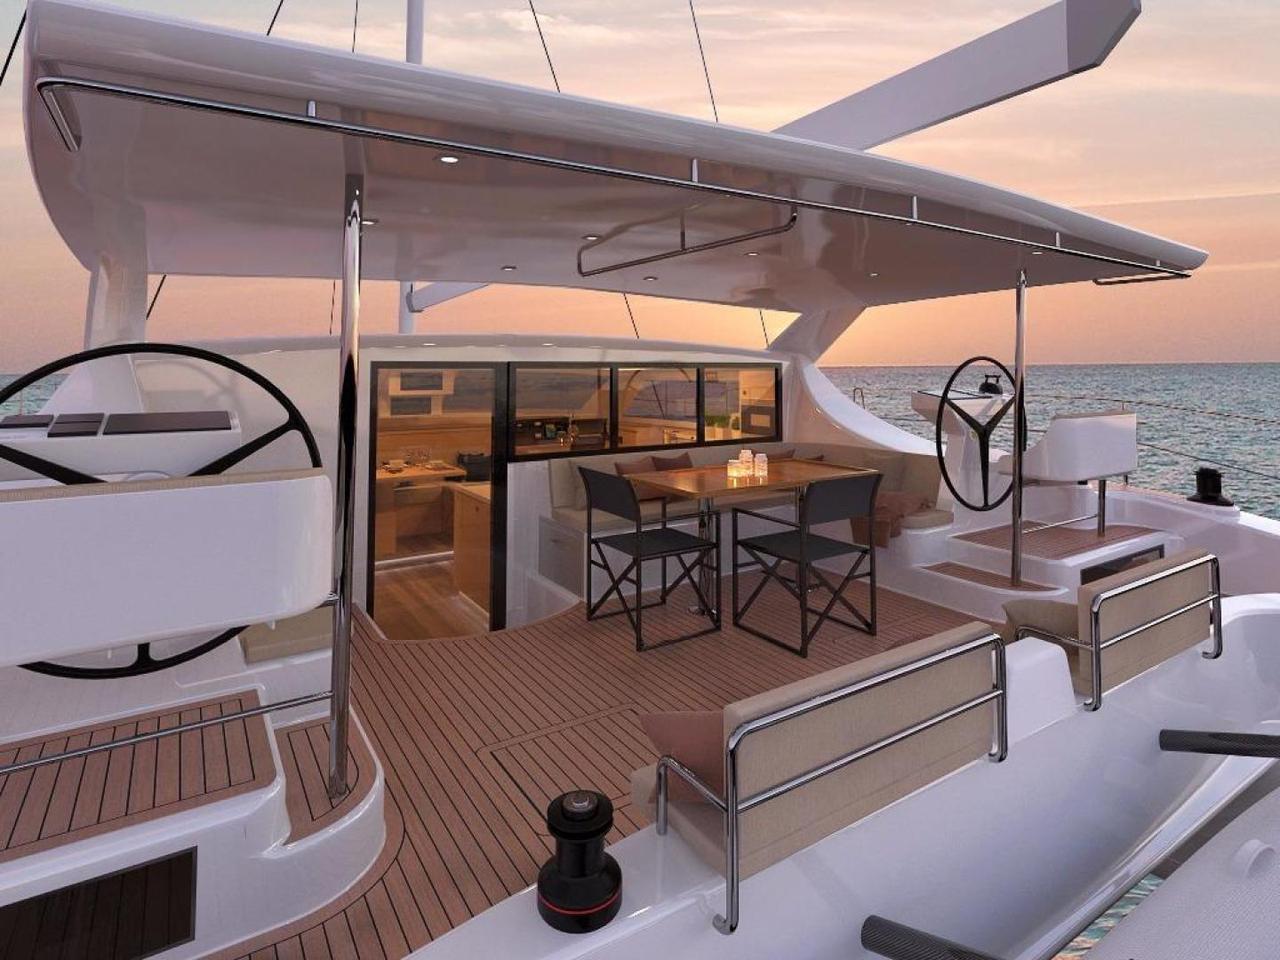 2019 New Seawind 1600 Multi-Hull Sailboat For Sale - San